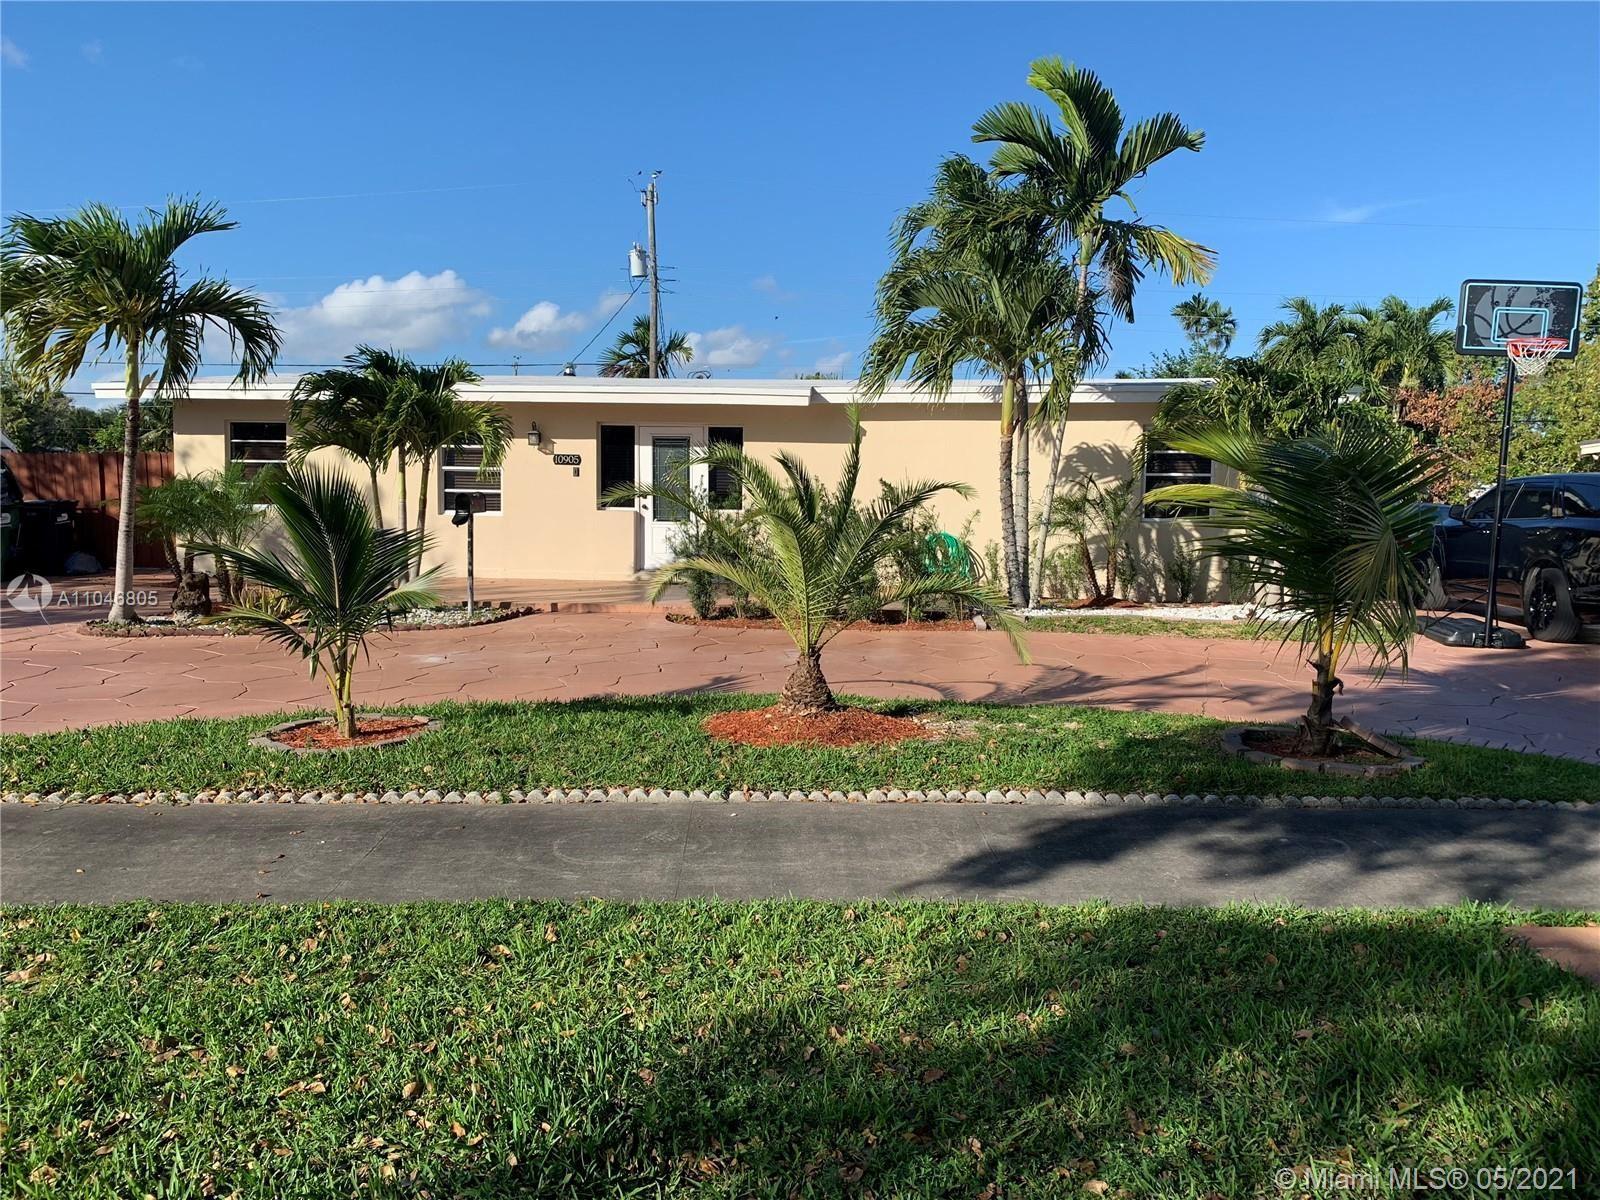 10905 SW 52nd Dr, Miami, FL 33165 - #: A11046805